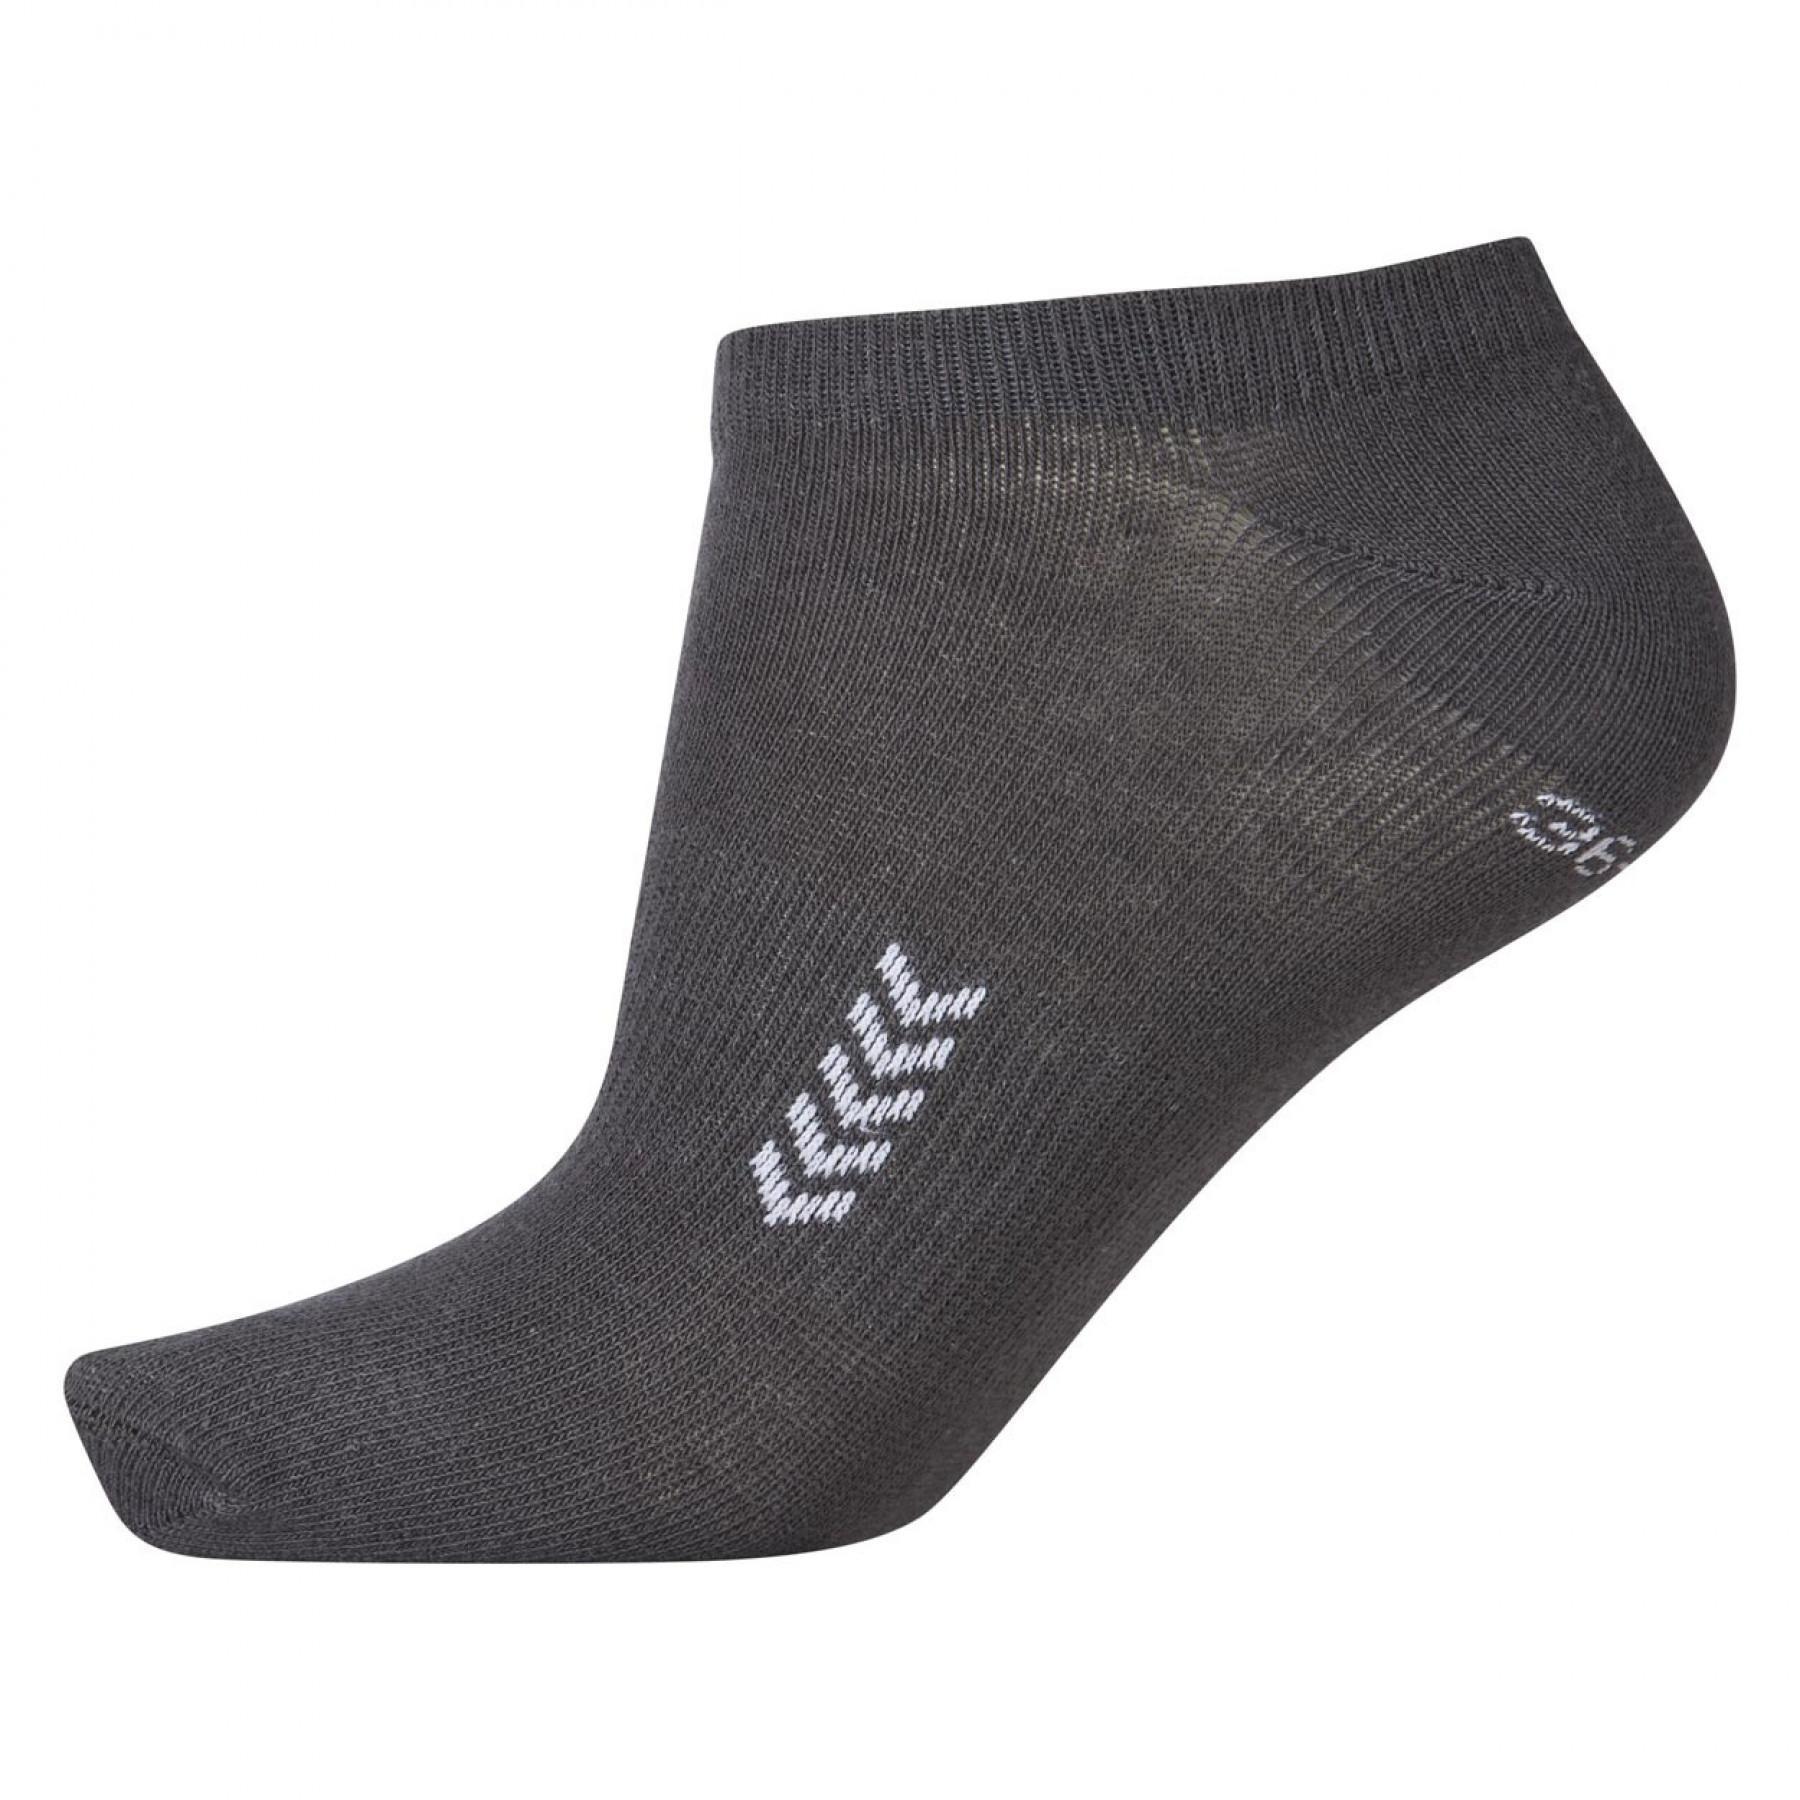 Hummel socks strap SMU